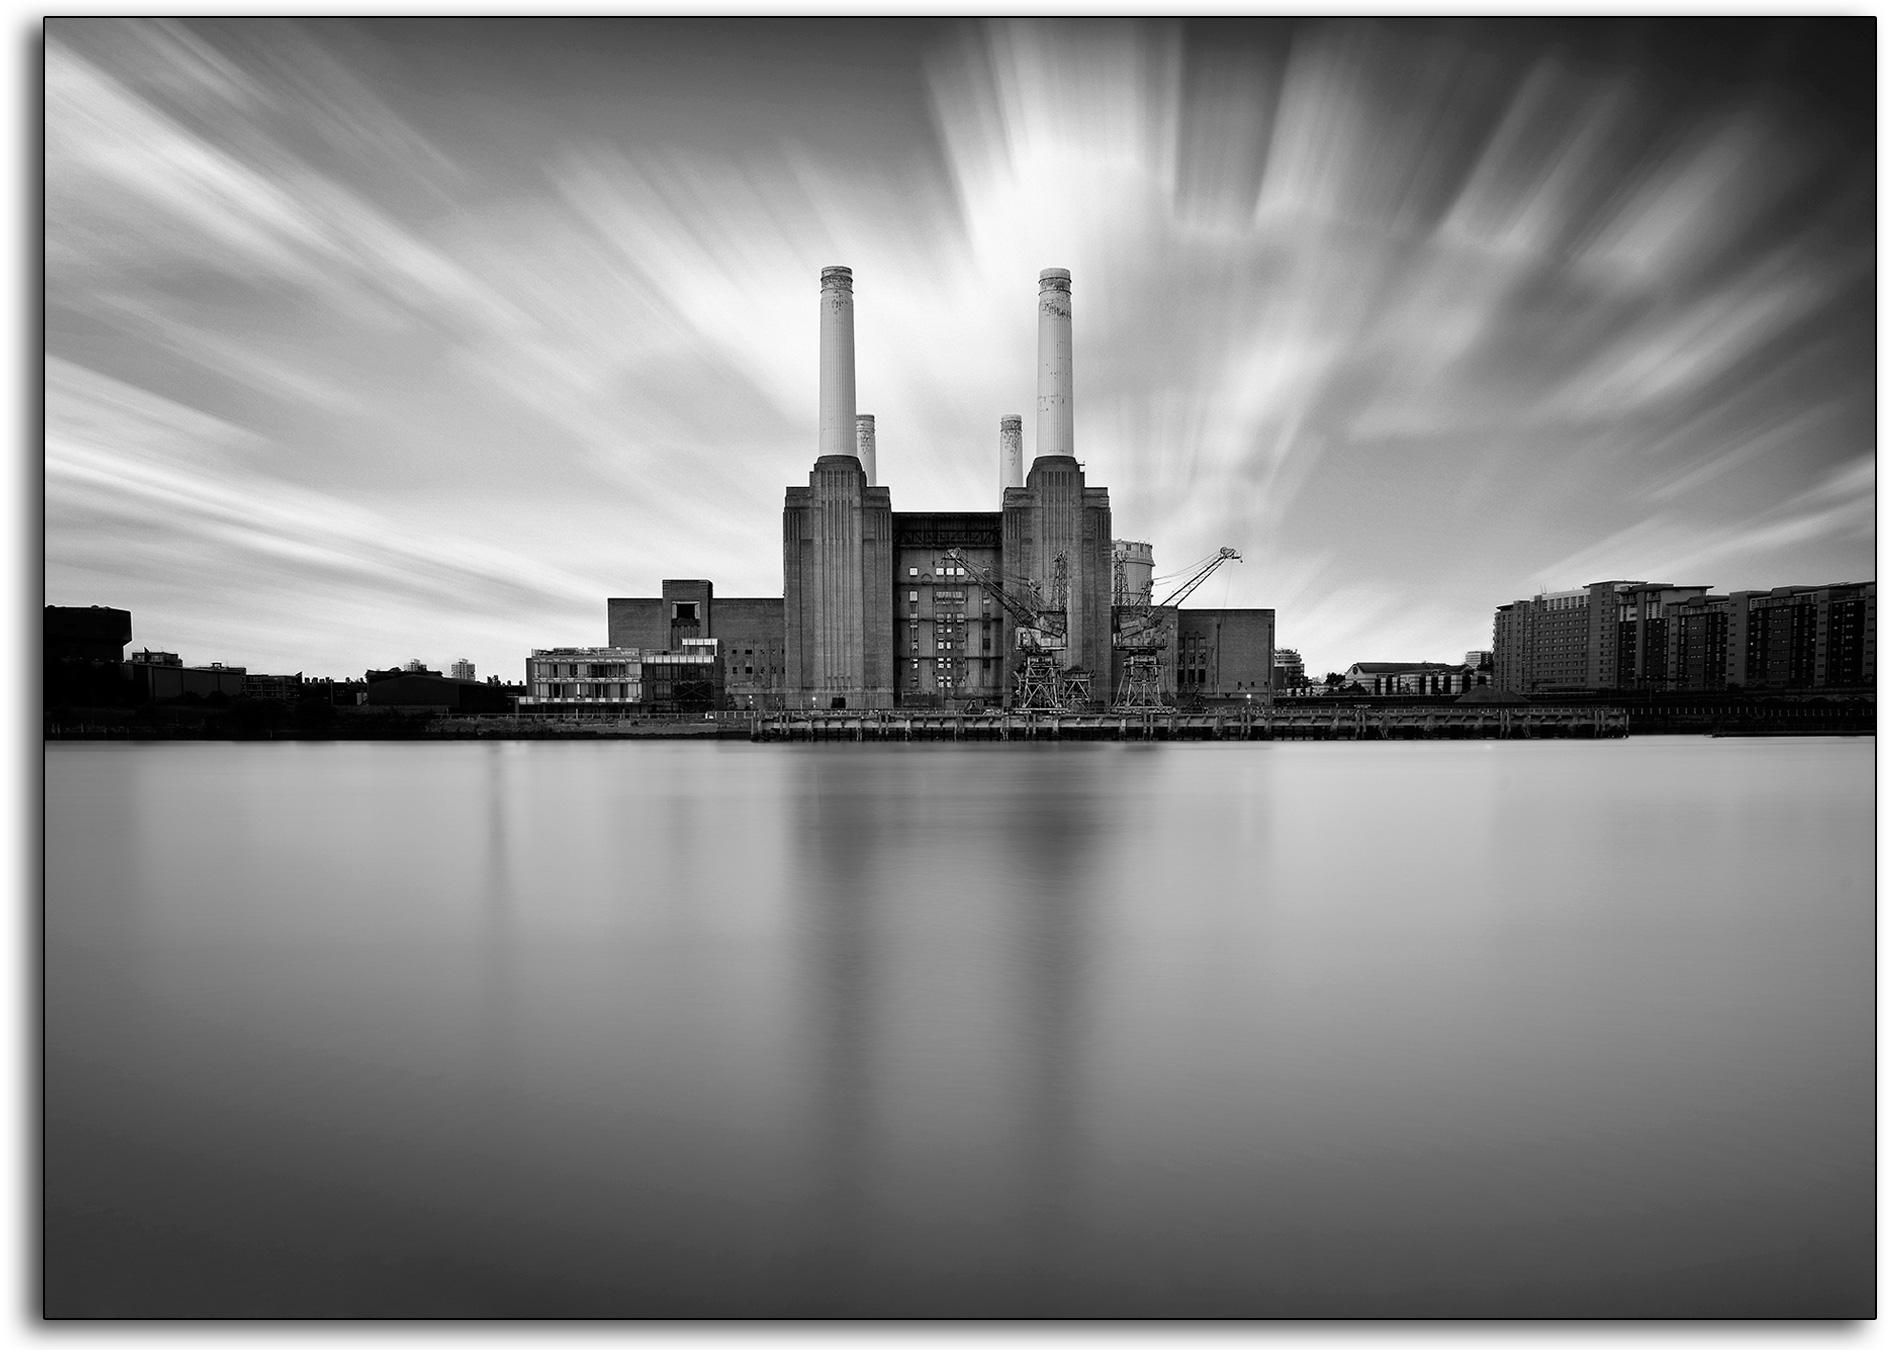 boarder 11 power station Battersea derilict black and white monochrome no colour long exposure landscape professional photographer lee ramsden london www.leeramsden.com.jpg